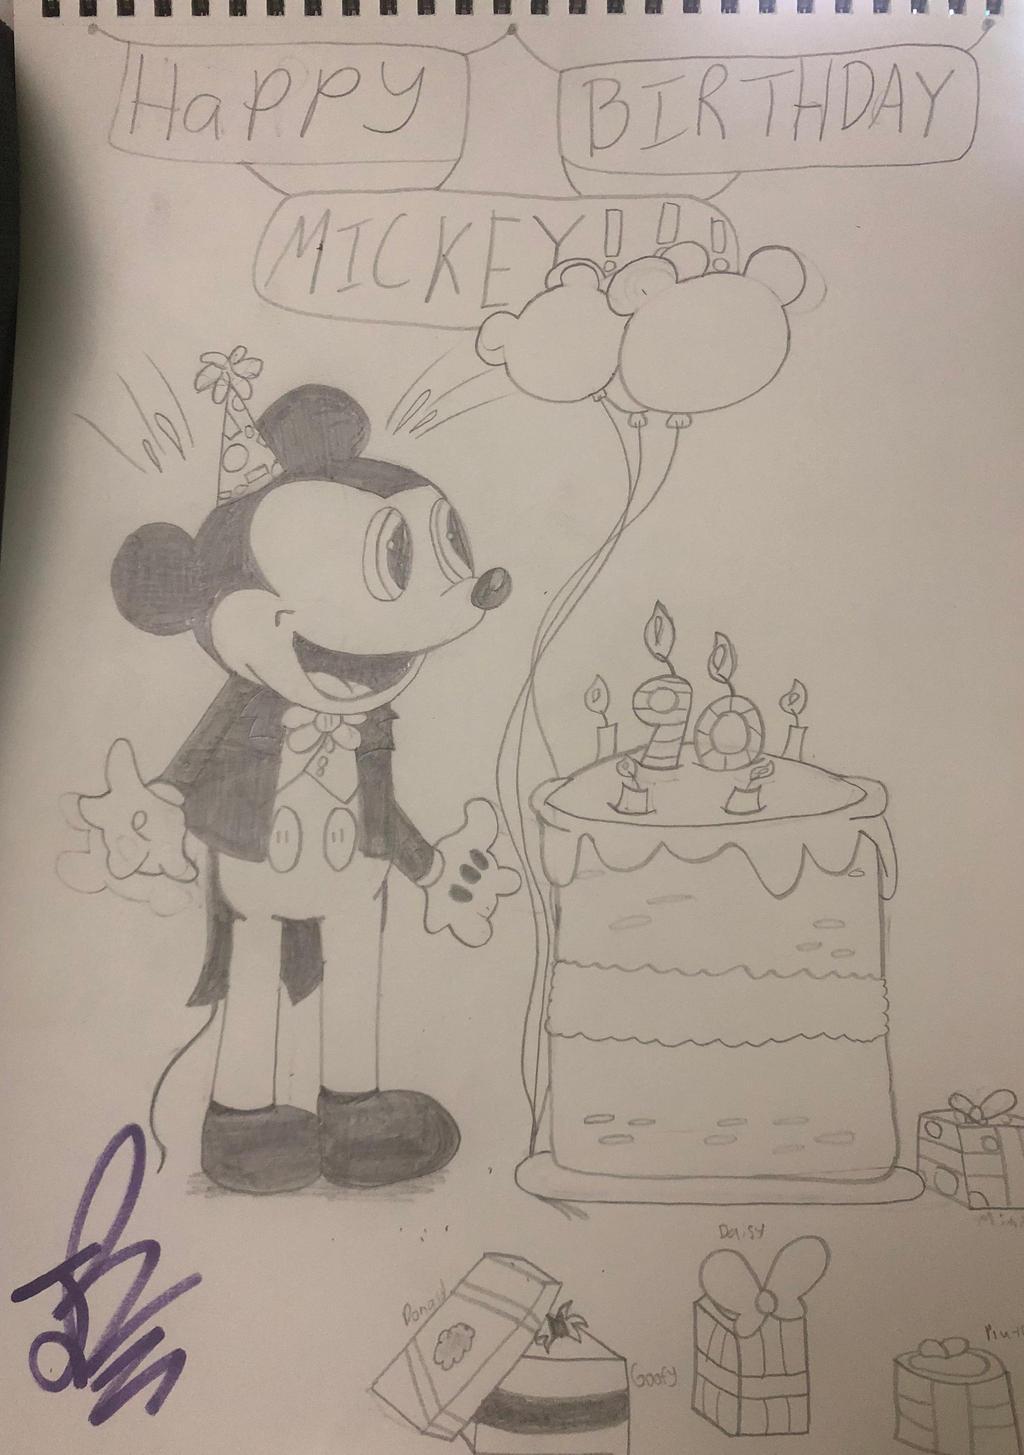 Happy Birthday Mickey Mouse Pencil Sketch By Jrechani18 On Deviantart